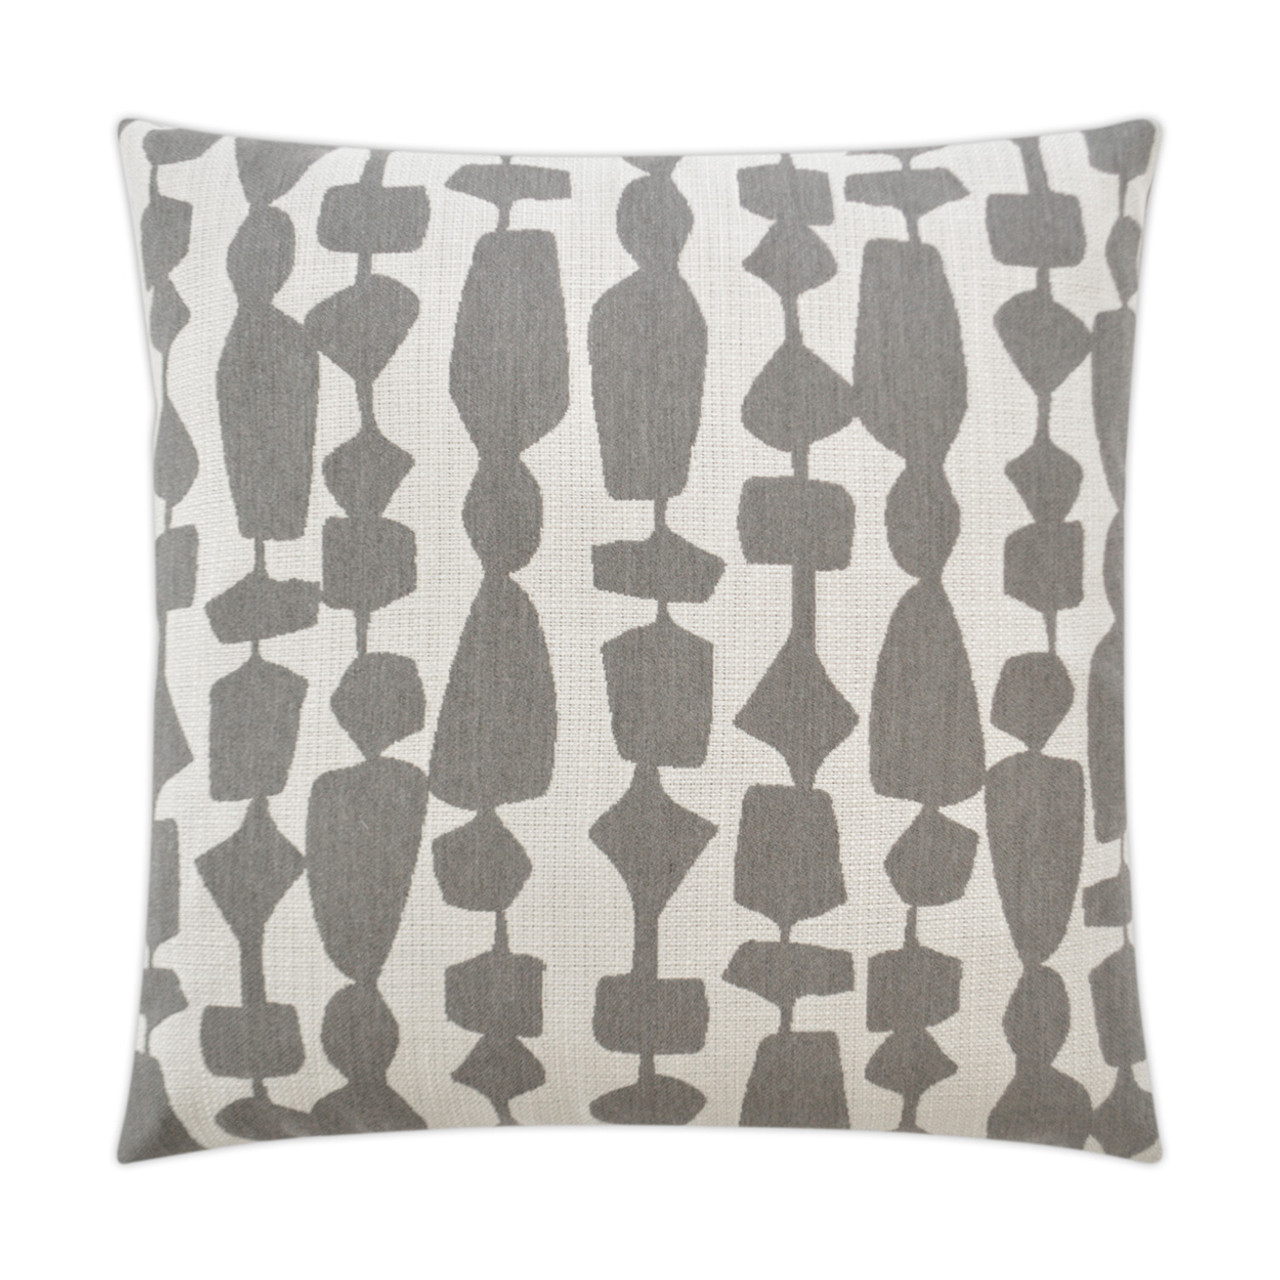 Freya Graphic Outdoor Throw Pillow